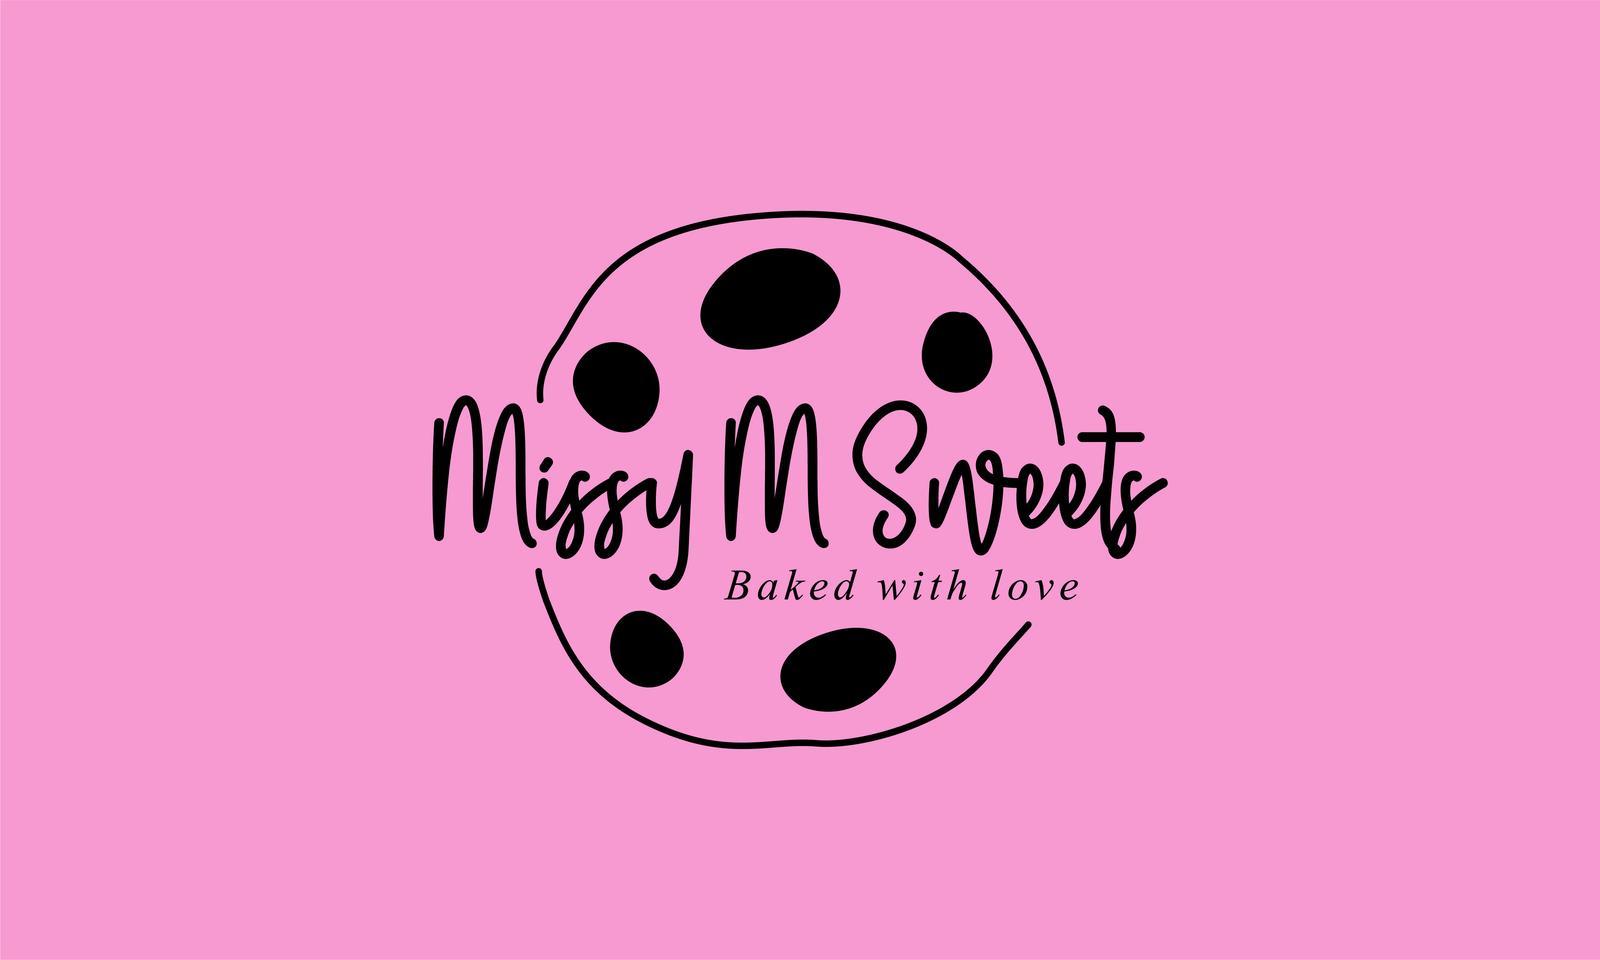 Missy M Sweets logo